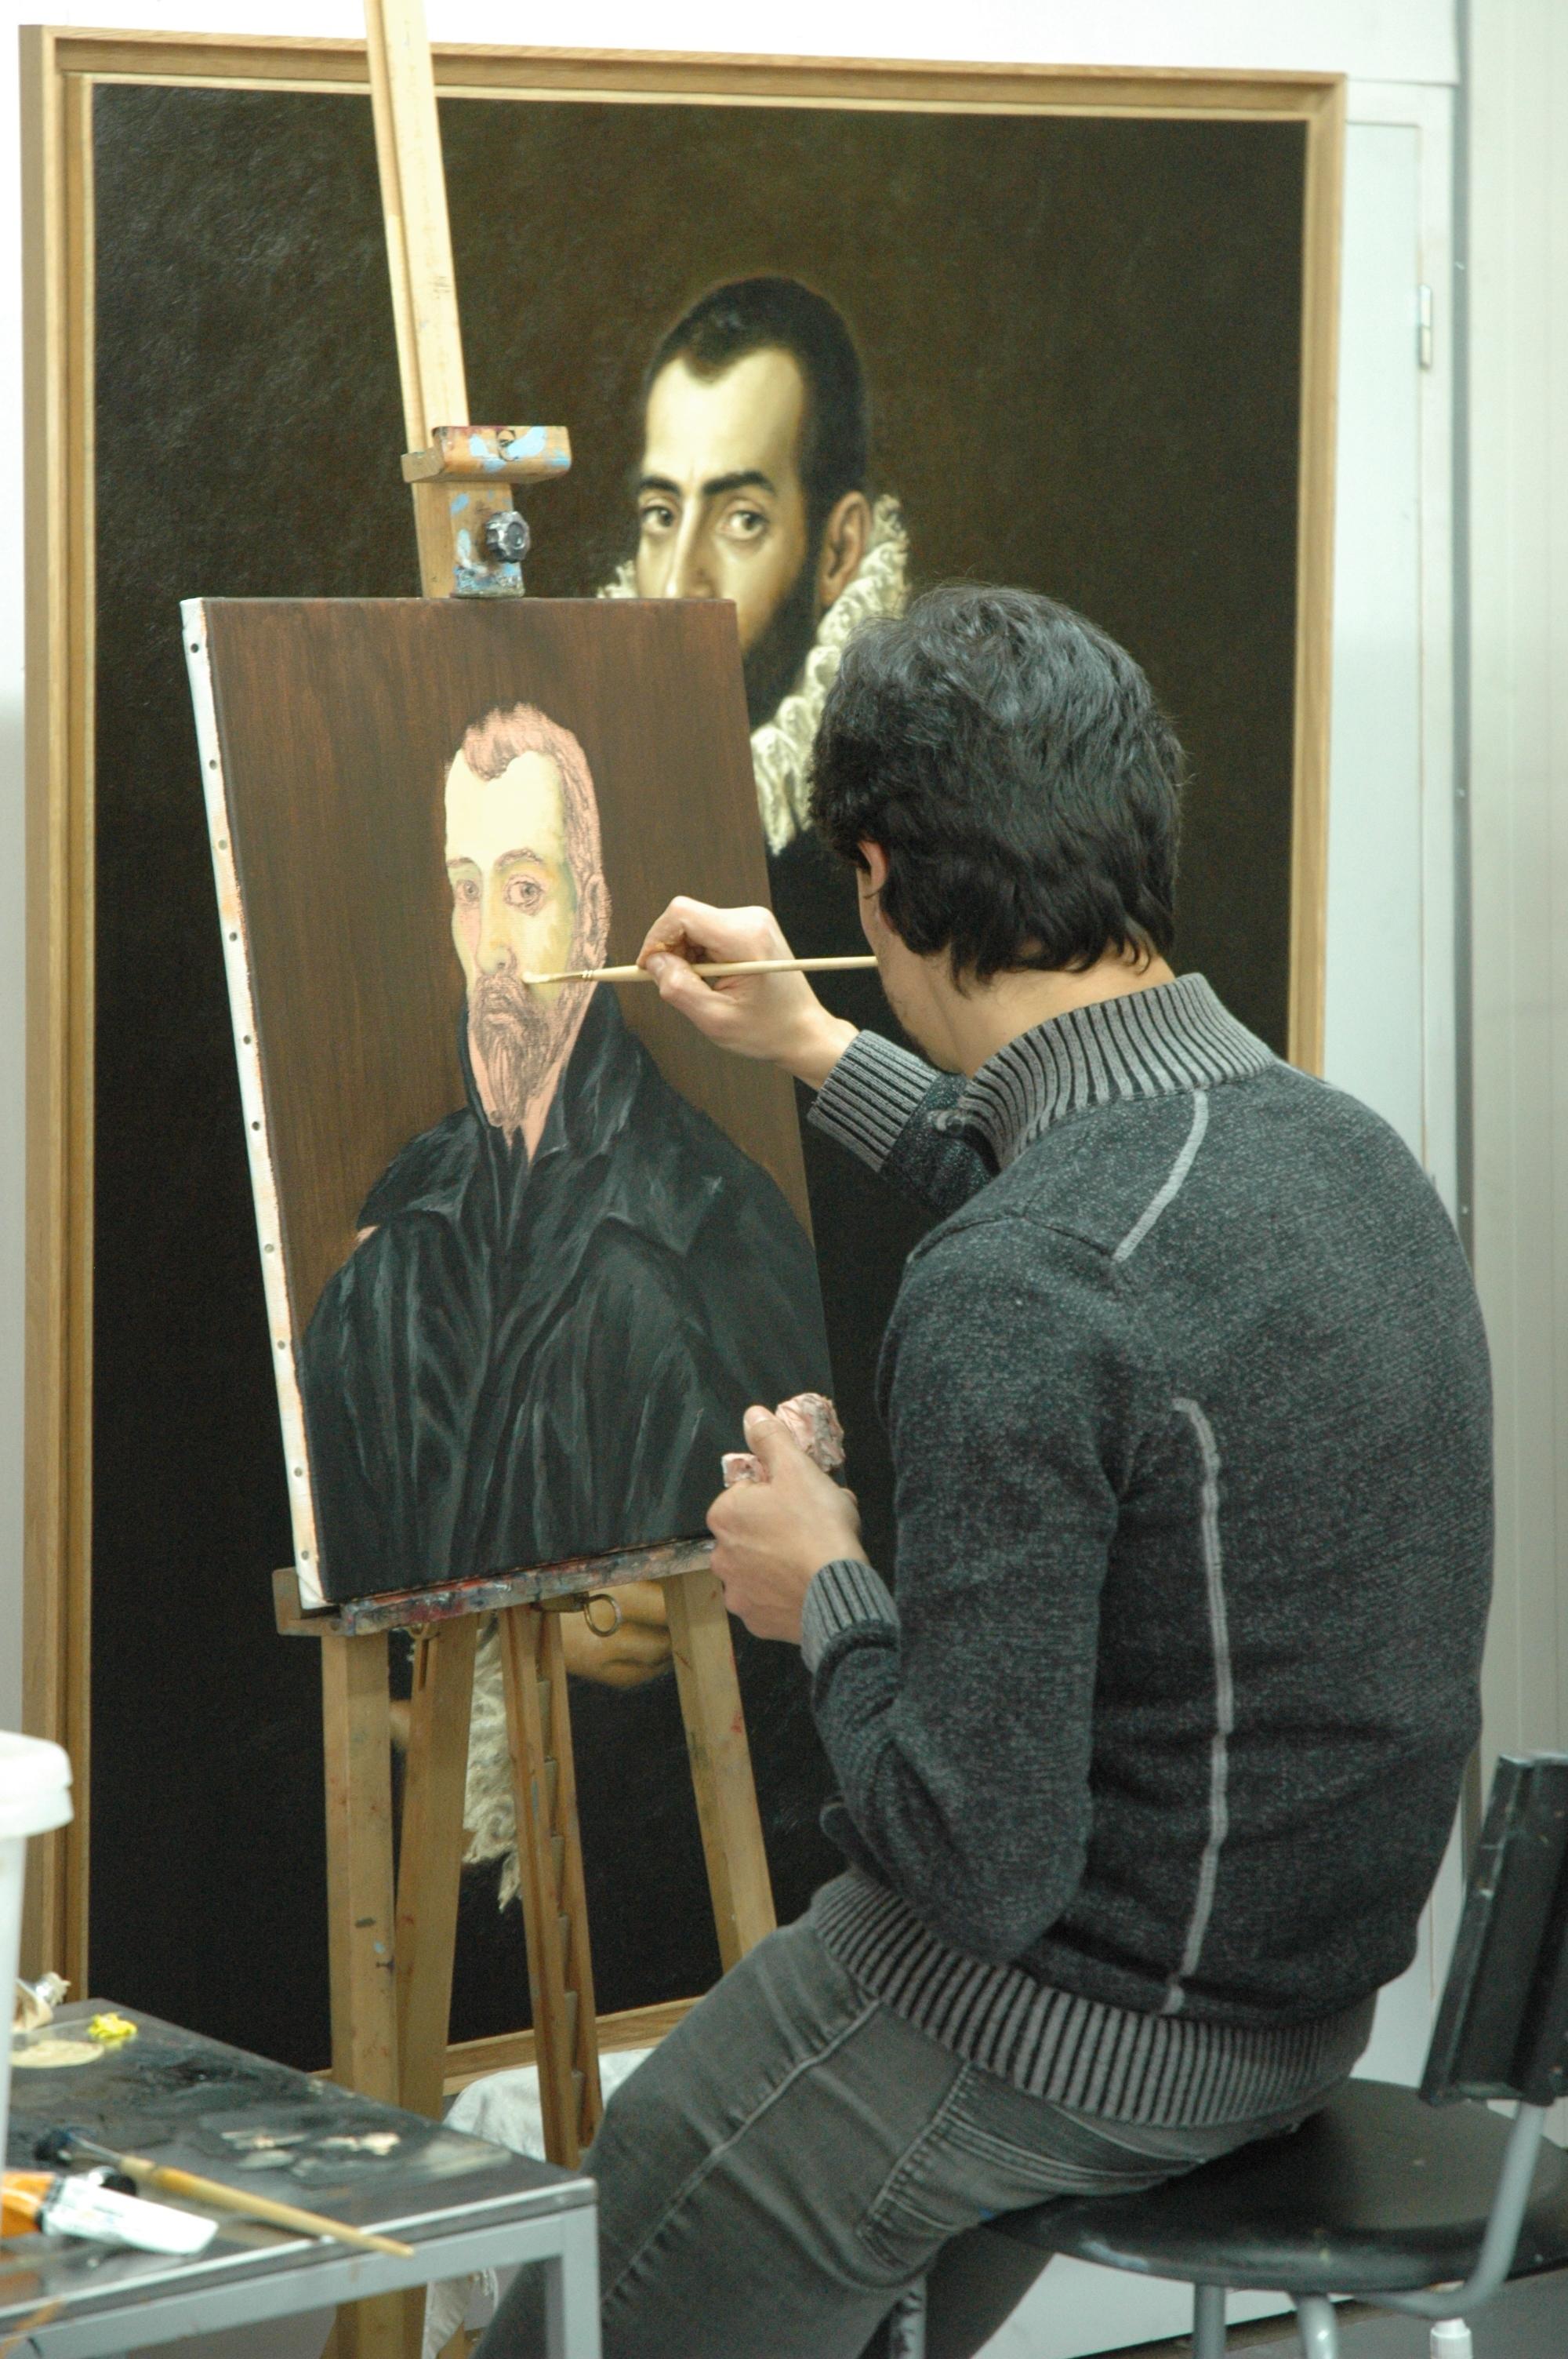 Edgar's Student copying Old Master El Greco